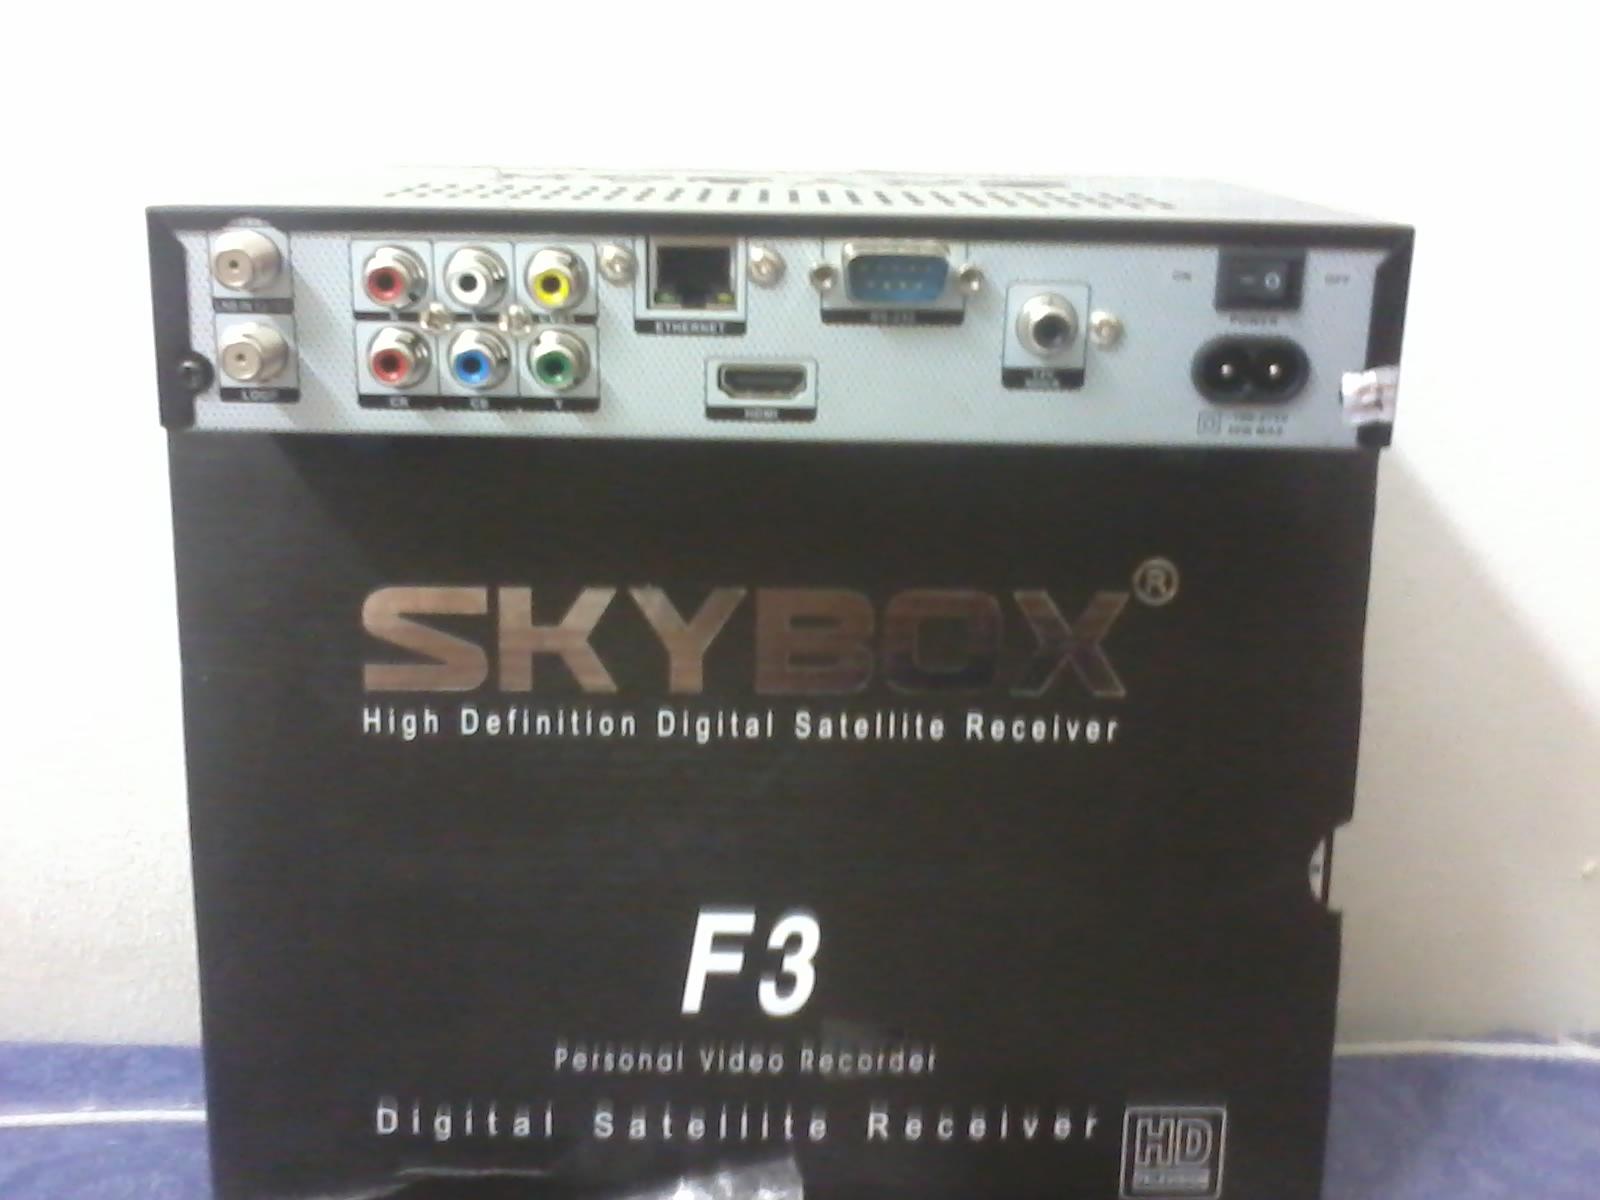 Menjual Skybox Decoder yang Terkini di Pasaran sebagai Alternatif